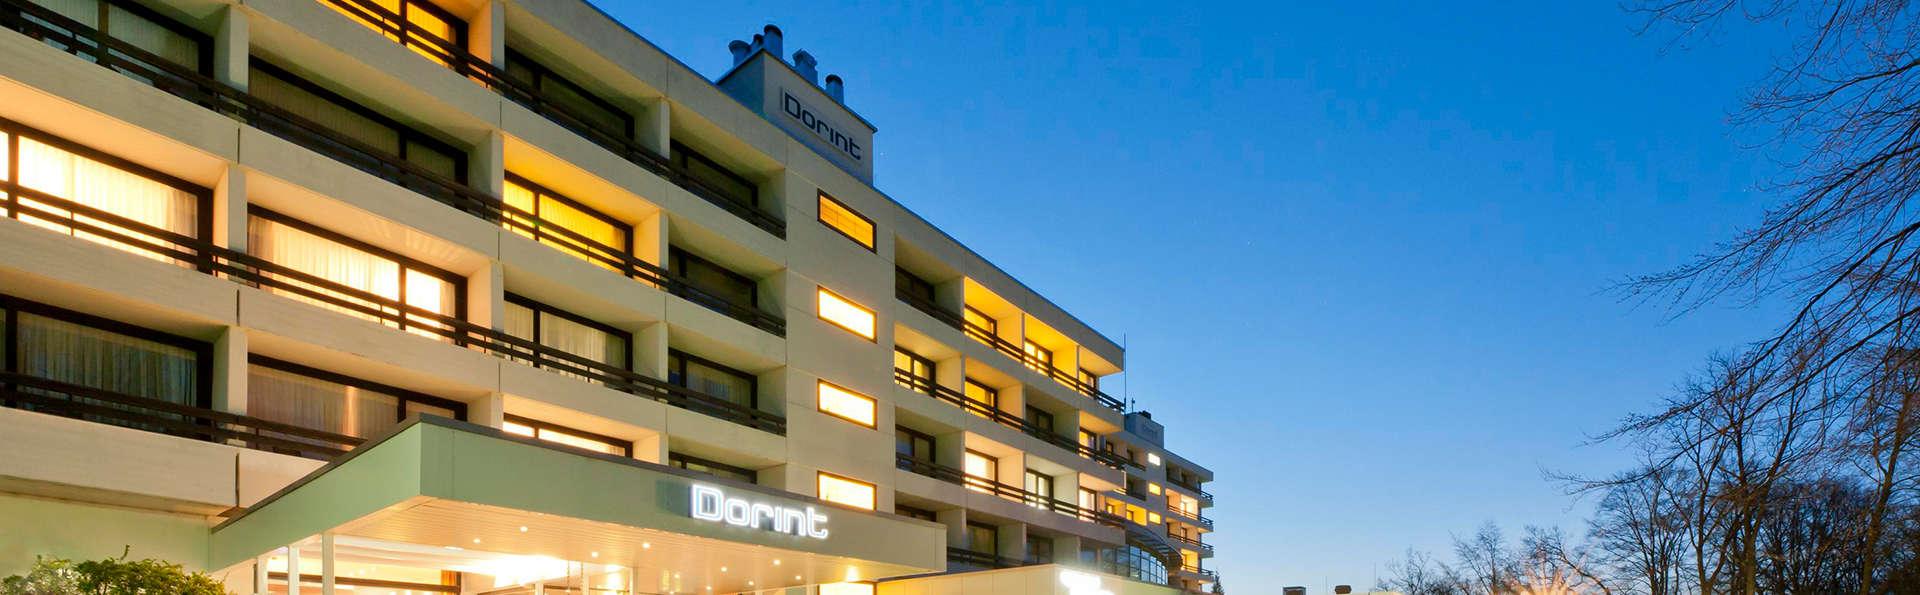 Dorint Hotel & Sportresort Arnsberg/Sauerland - Edit_Front.jpg